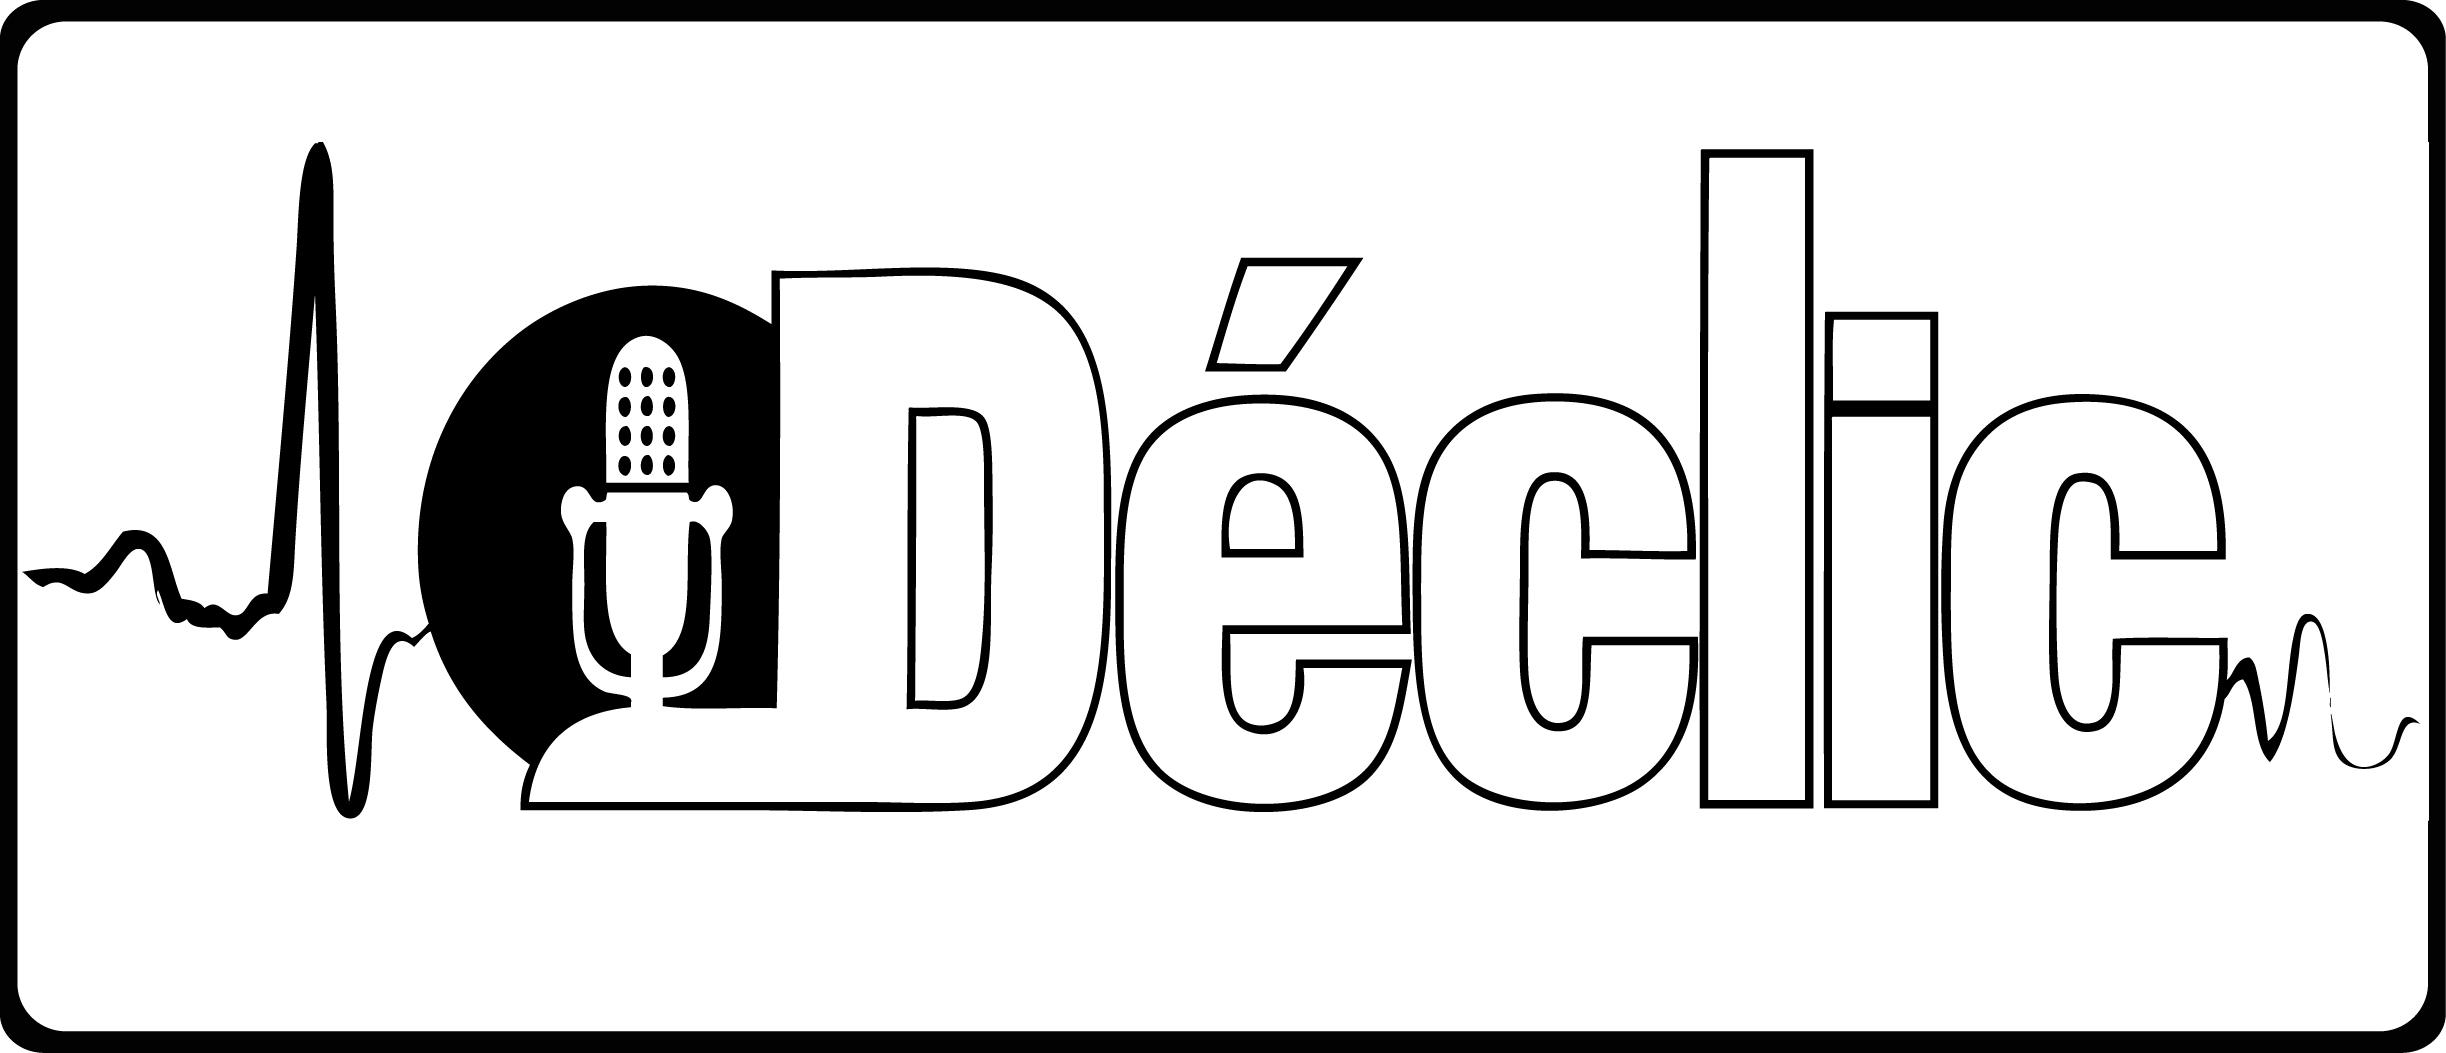 logo declic noir et blanc